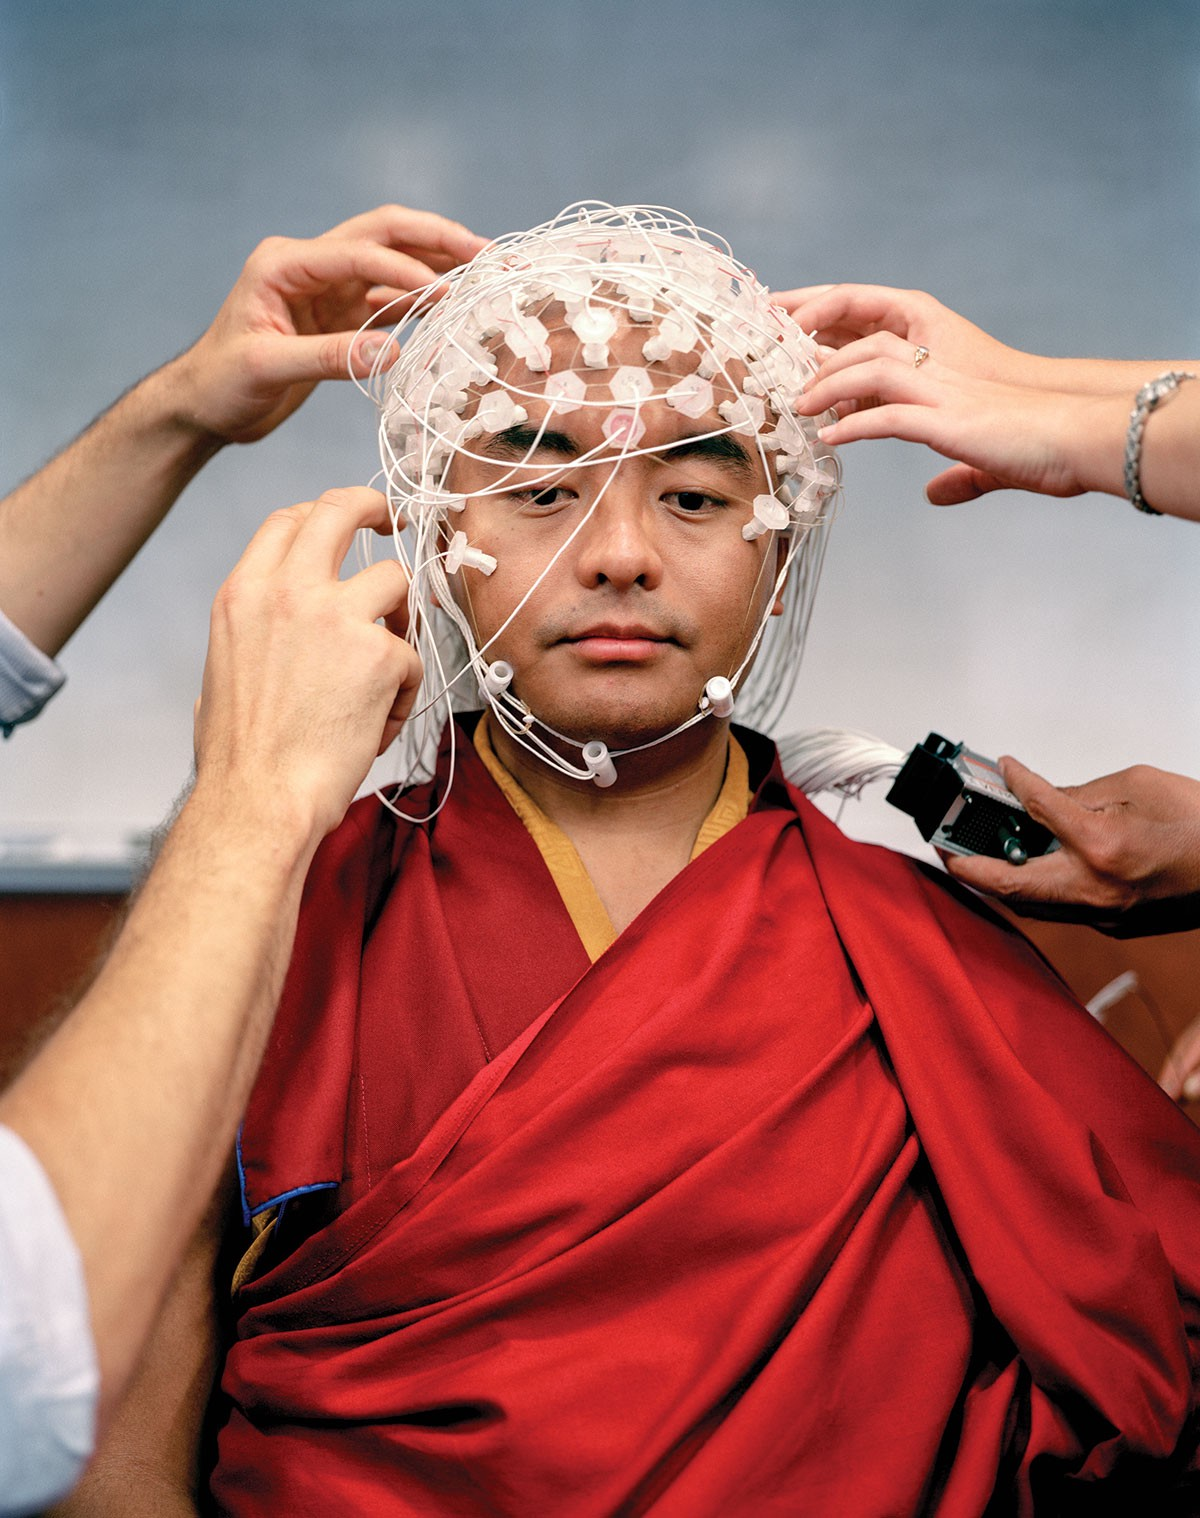 Yongey Mingyur Rinpoche. Brian Ulrich